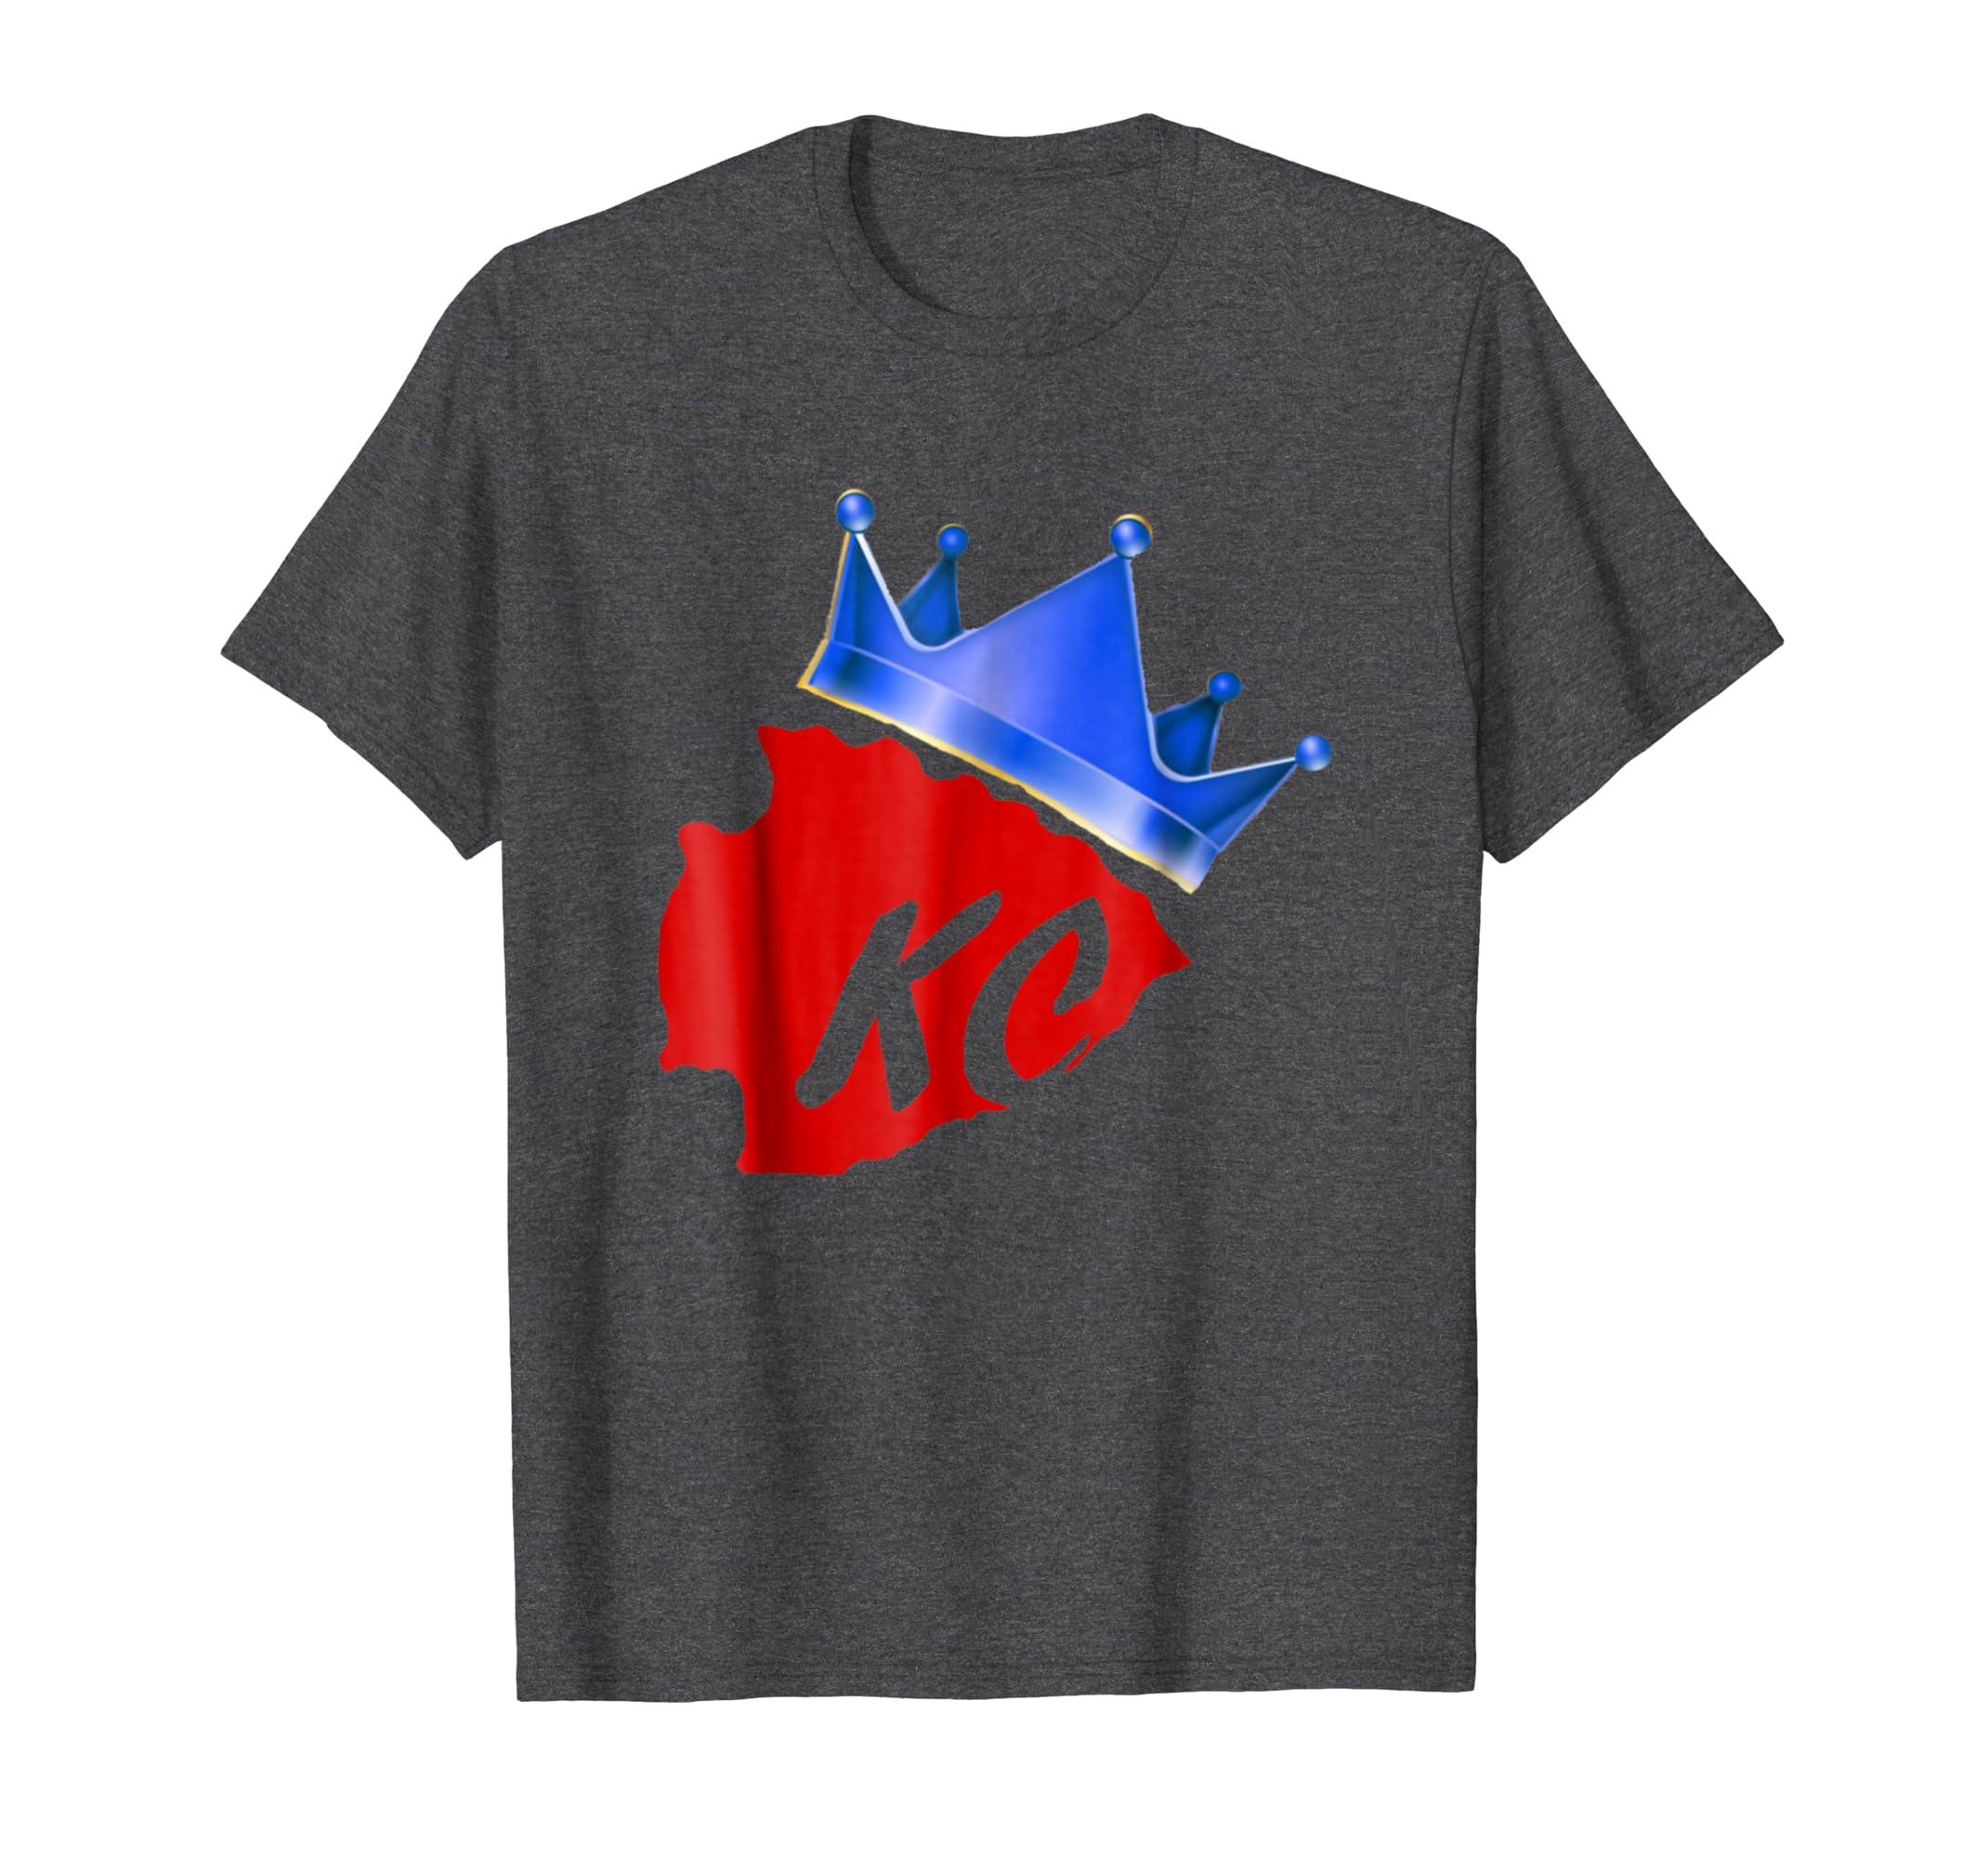 huge selection of 0cfa6 d8e5e Amazon.com: Chiefs Kingdom Royals Hybrid KC Shirt: Clothing